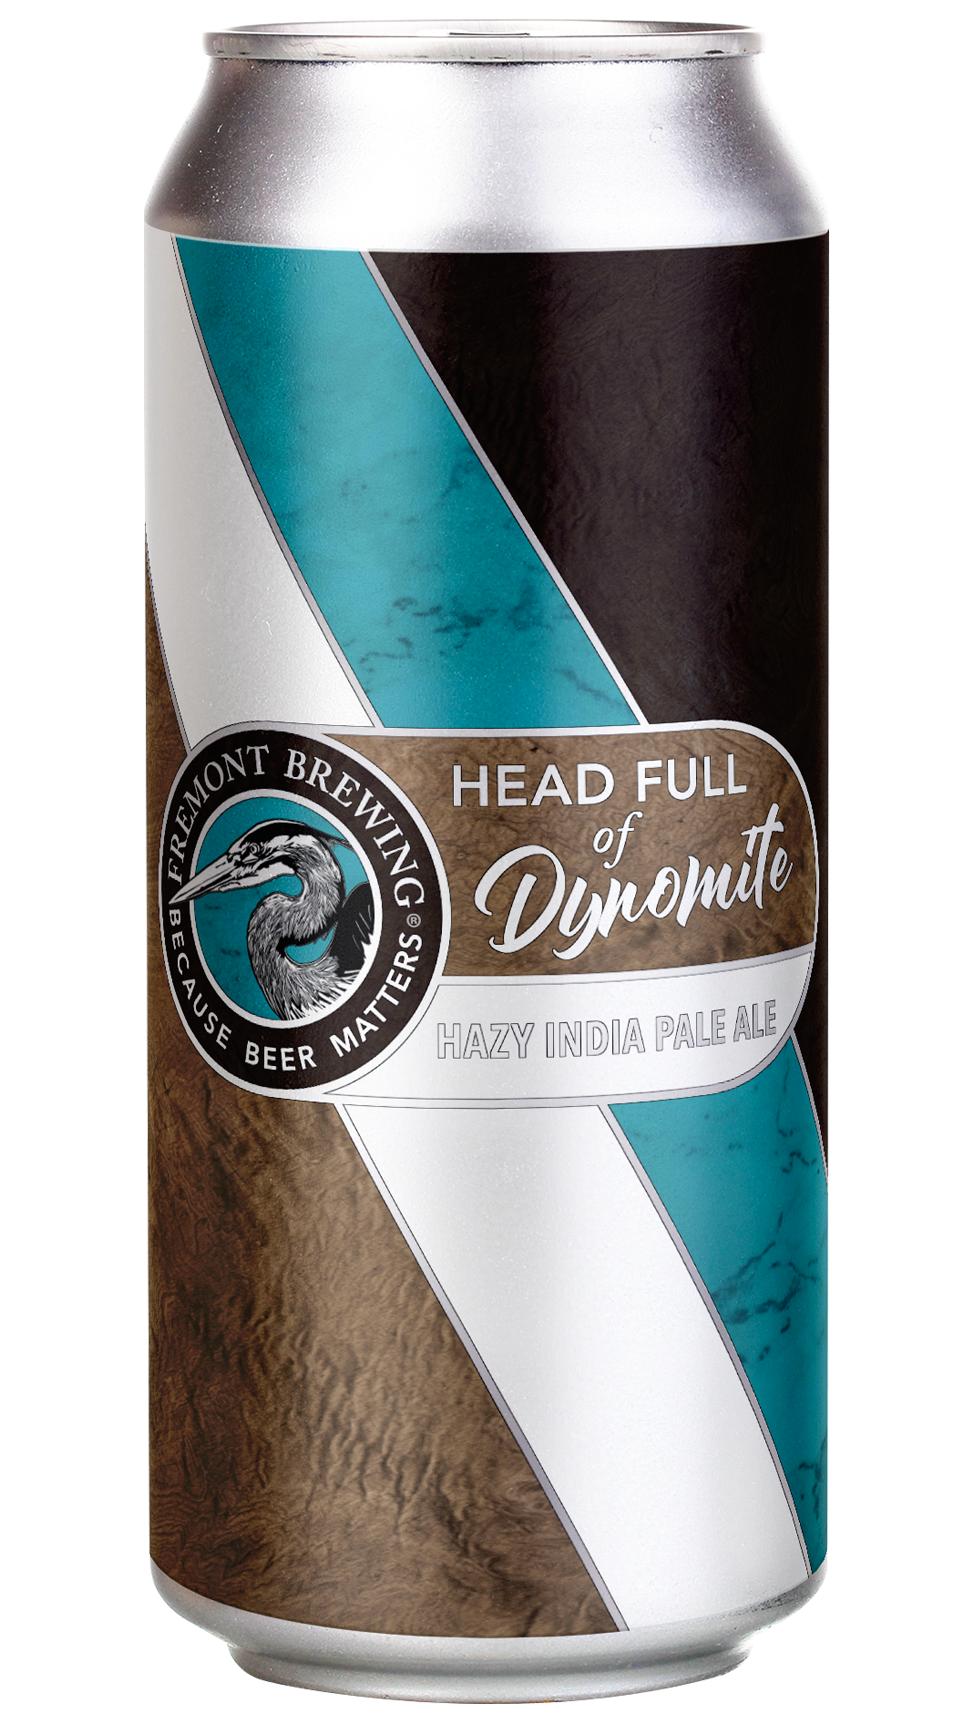 Head Full of Dynomite v.8